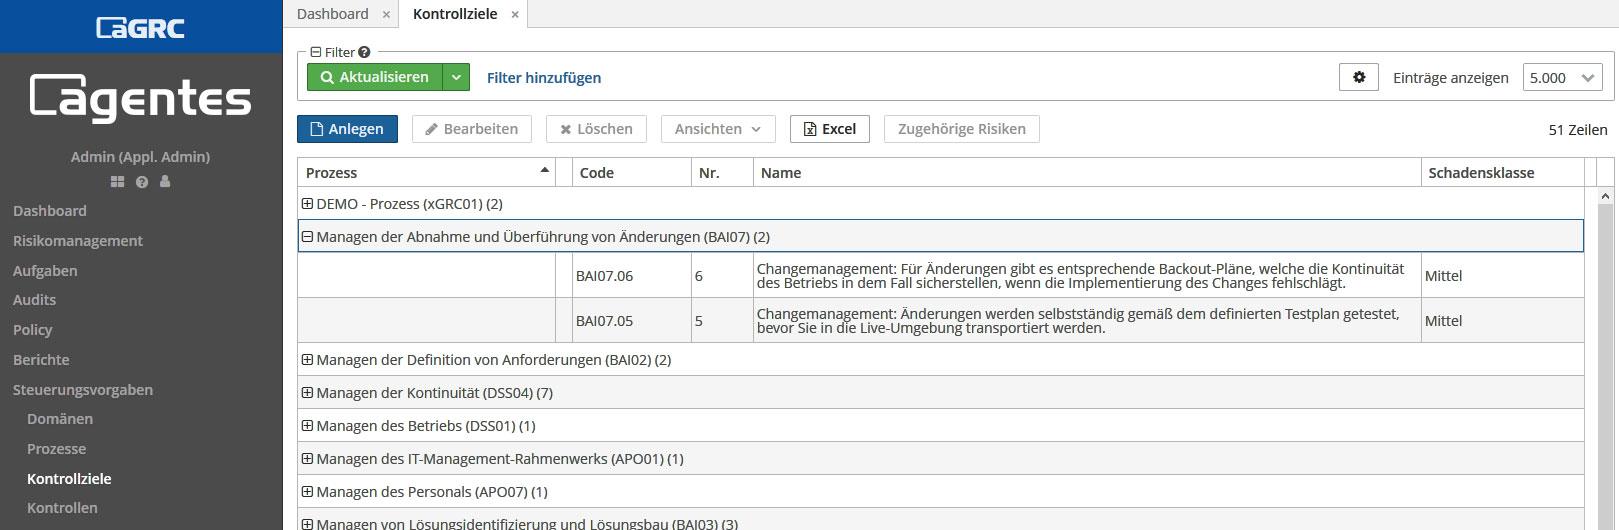 aGRC Software - Kontrollziele